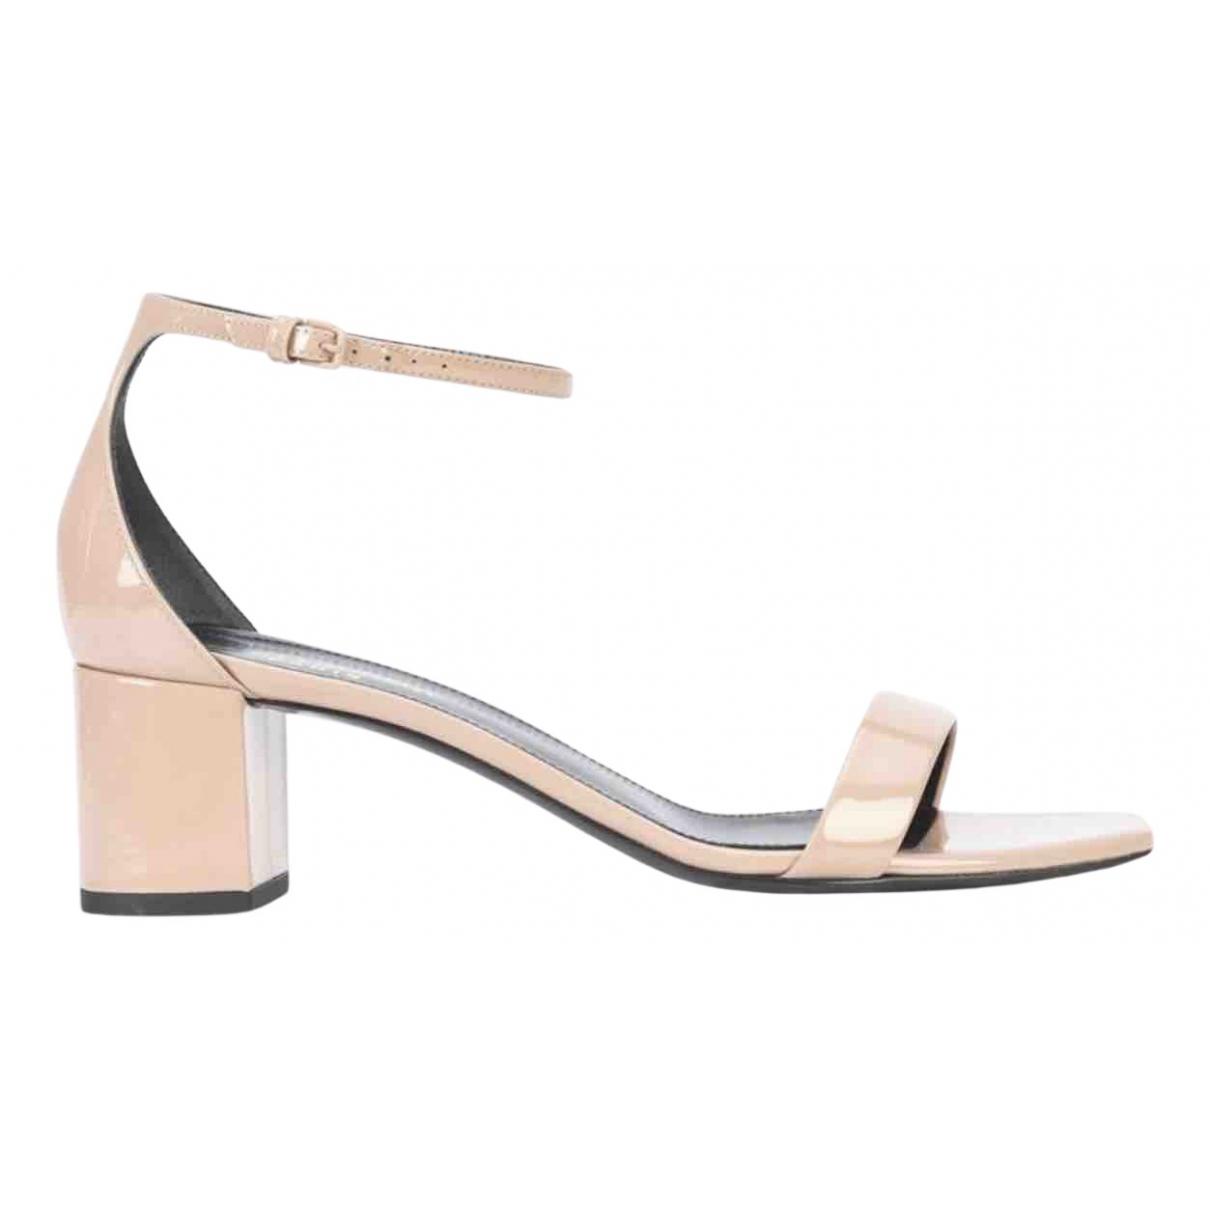 Saint Laurent Loulou Pink Patent leather Sandals for Women 39.5 EU